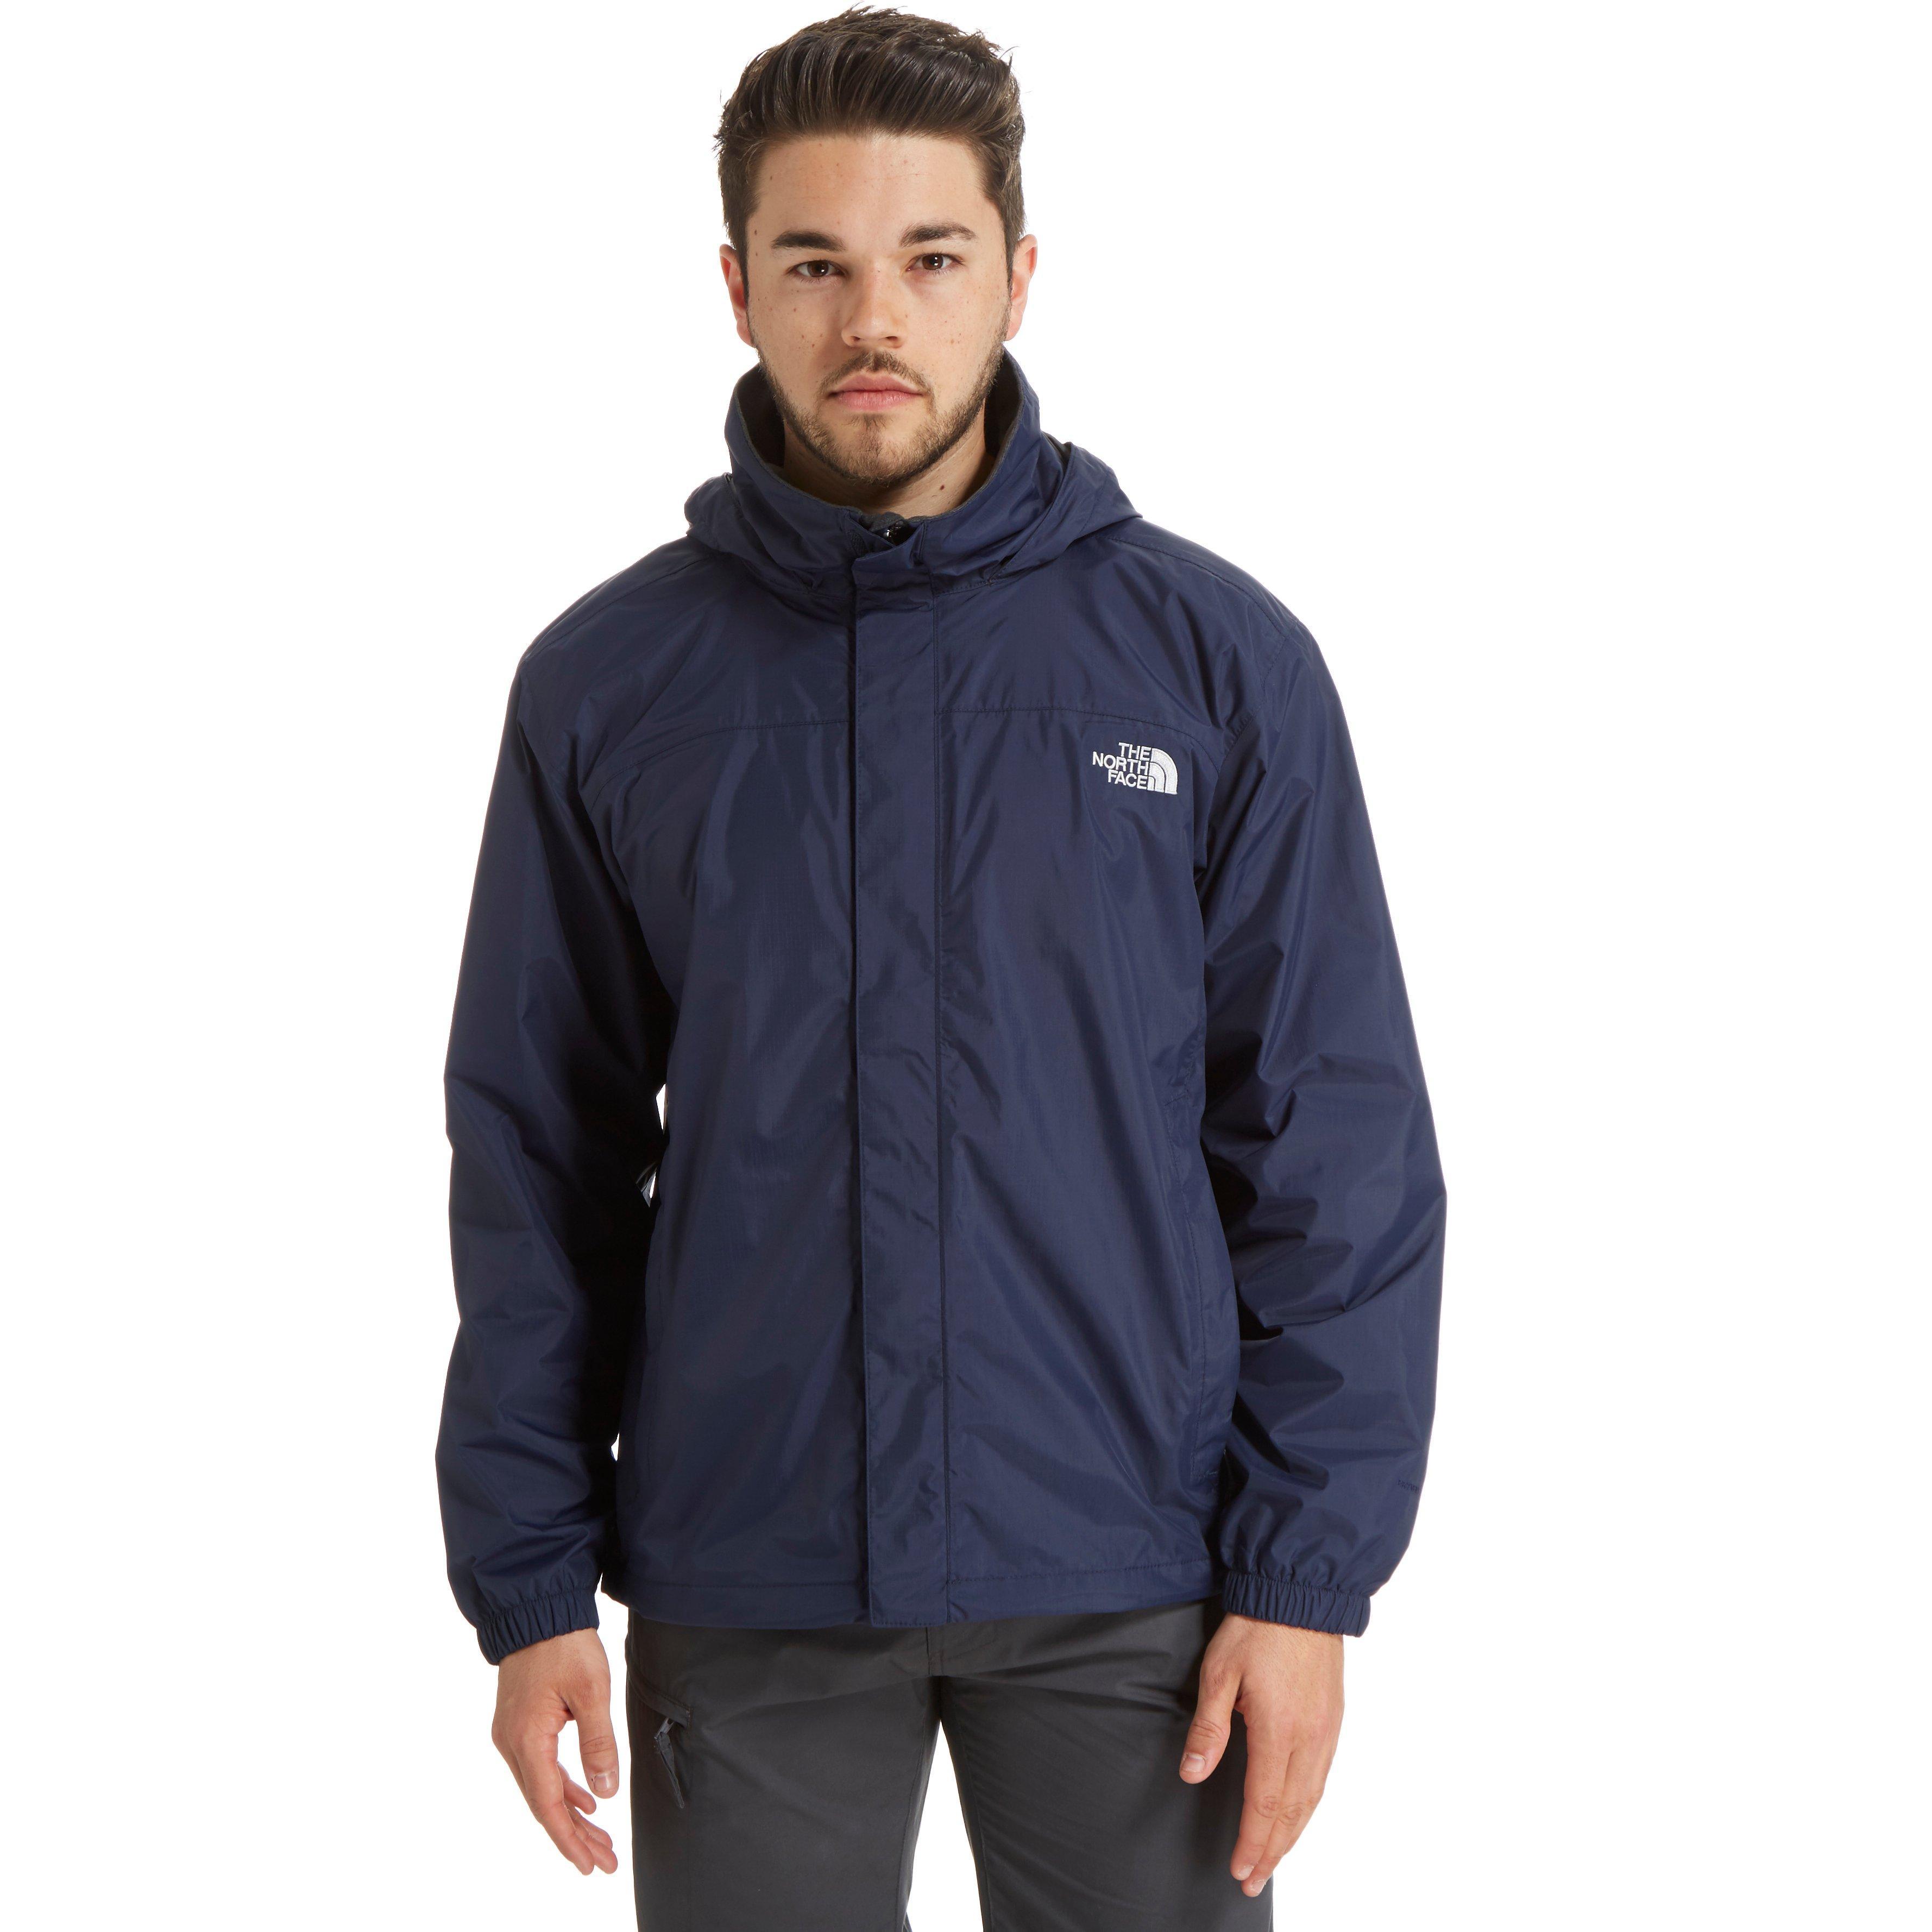 womens north face jacket 600 - Marwood VeneerMarwood Veneer de6b9de5a